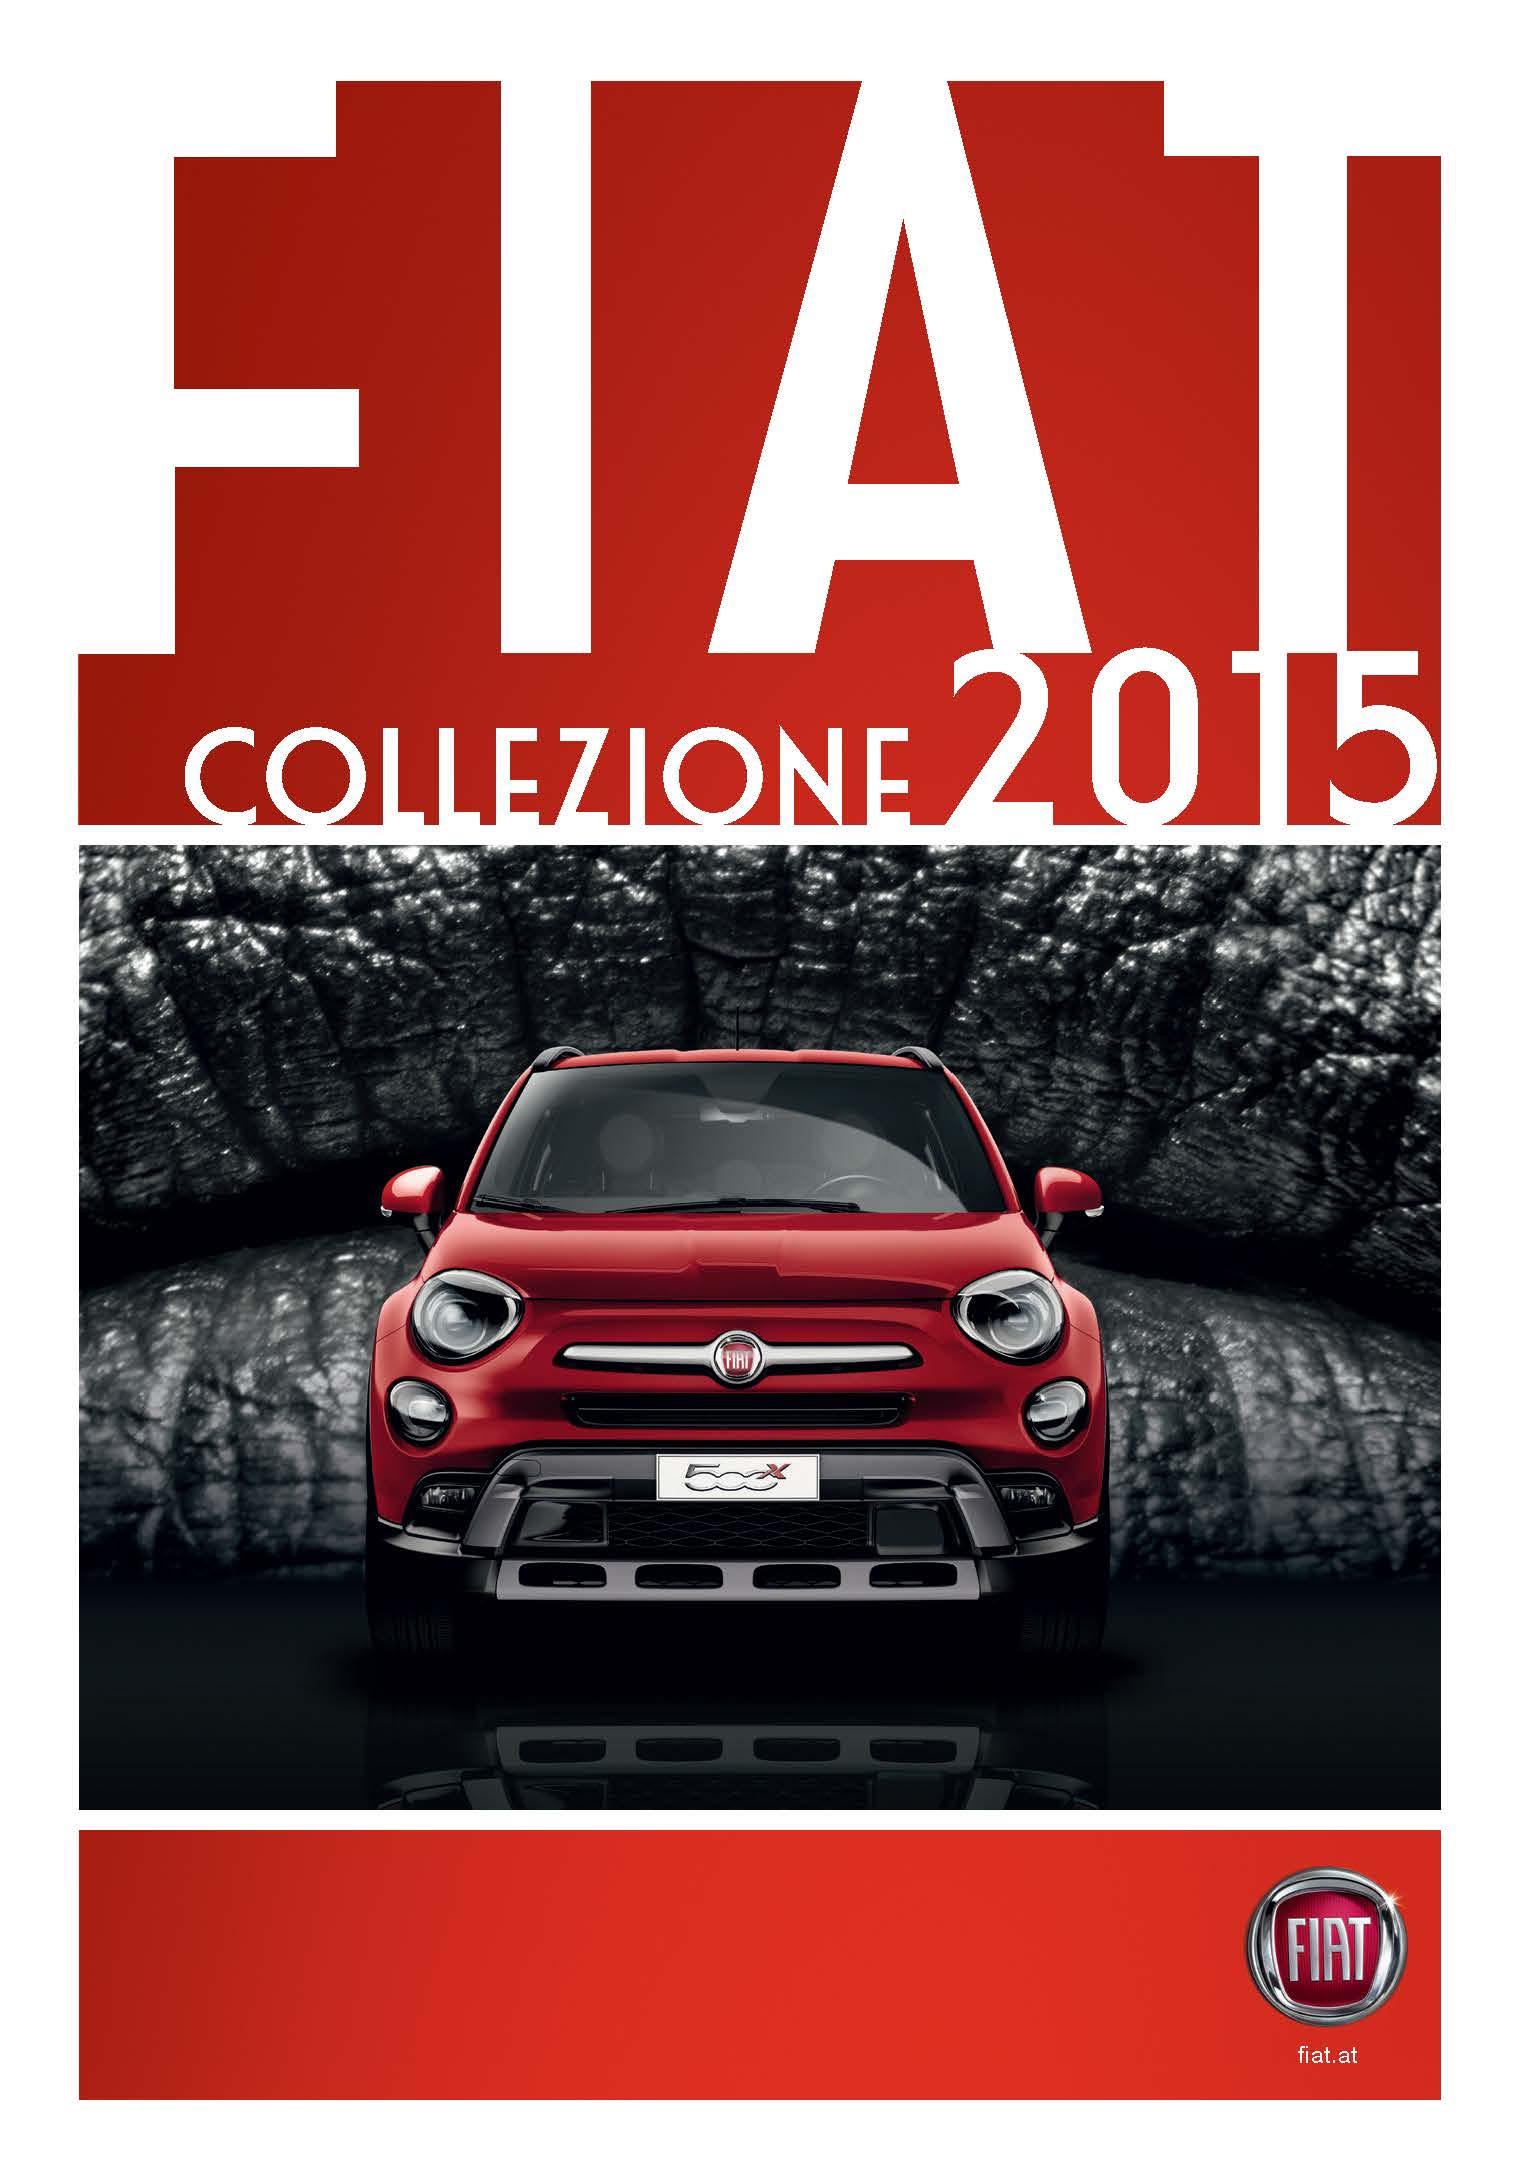 Fiat_Rangefolder_Q1_2015